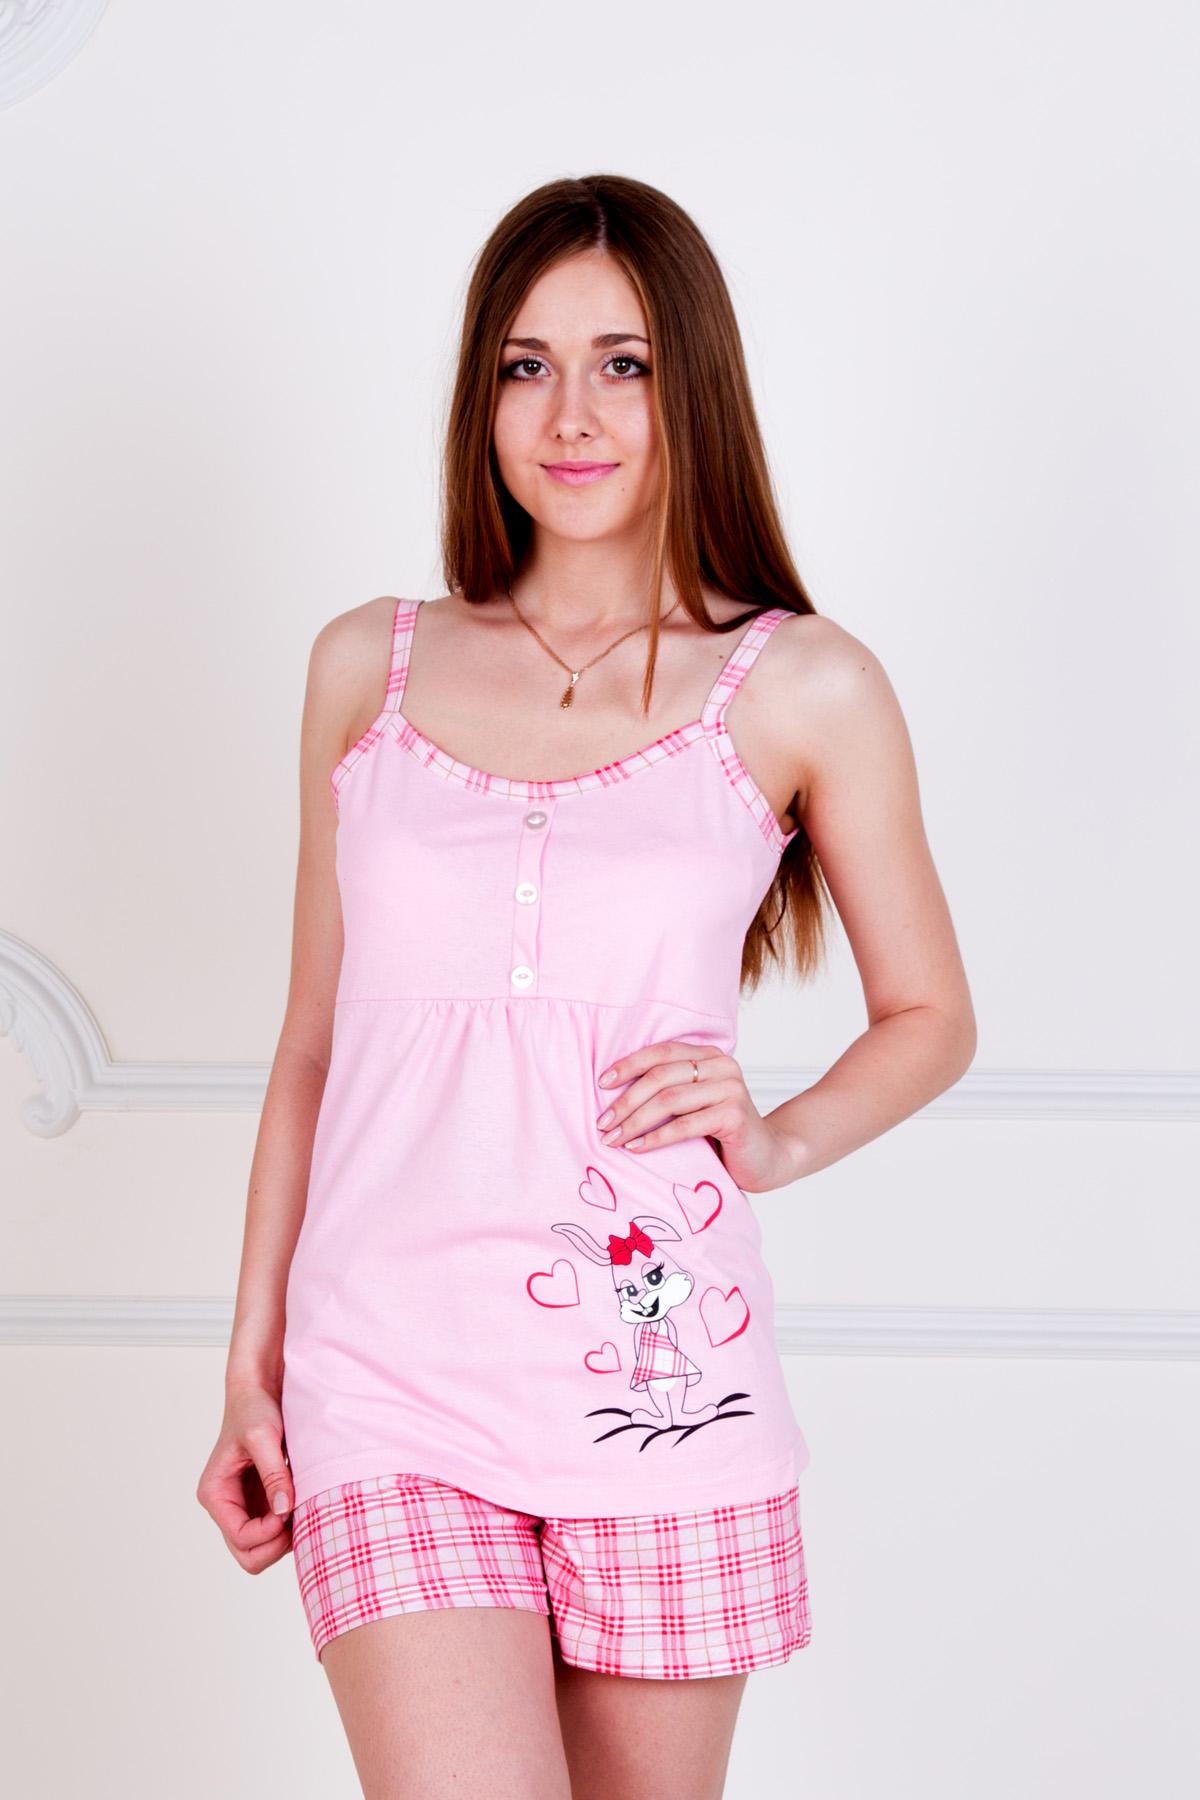 Жен. пижама Зайка Розовый р. 40 пижама жен mia cara майка шорты botanical aw15 ubl lst 264 р 42 44 1119503